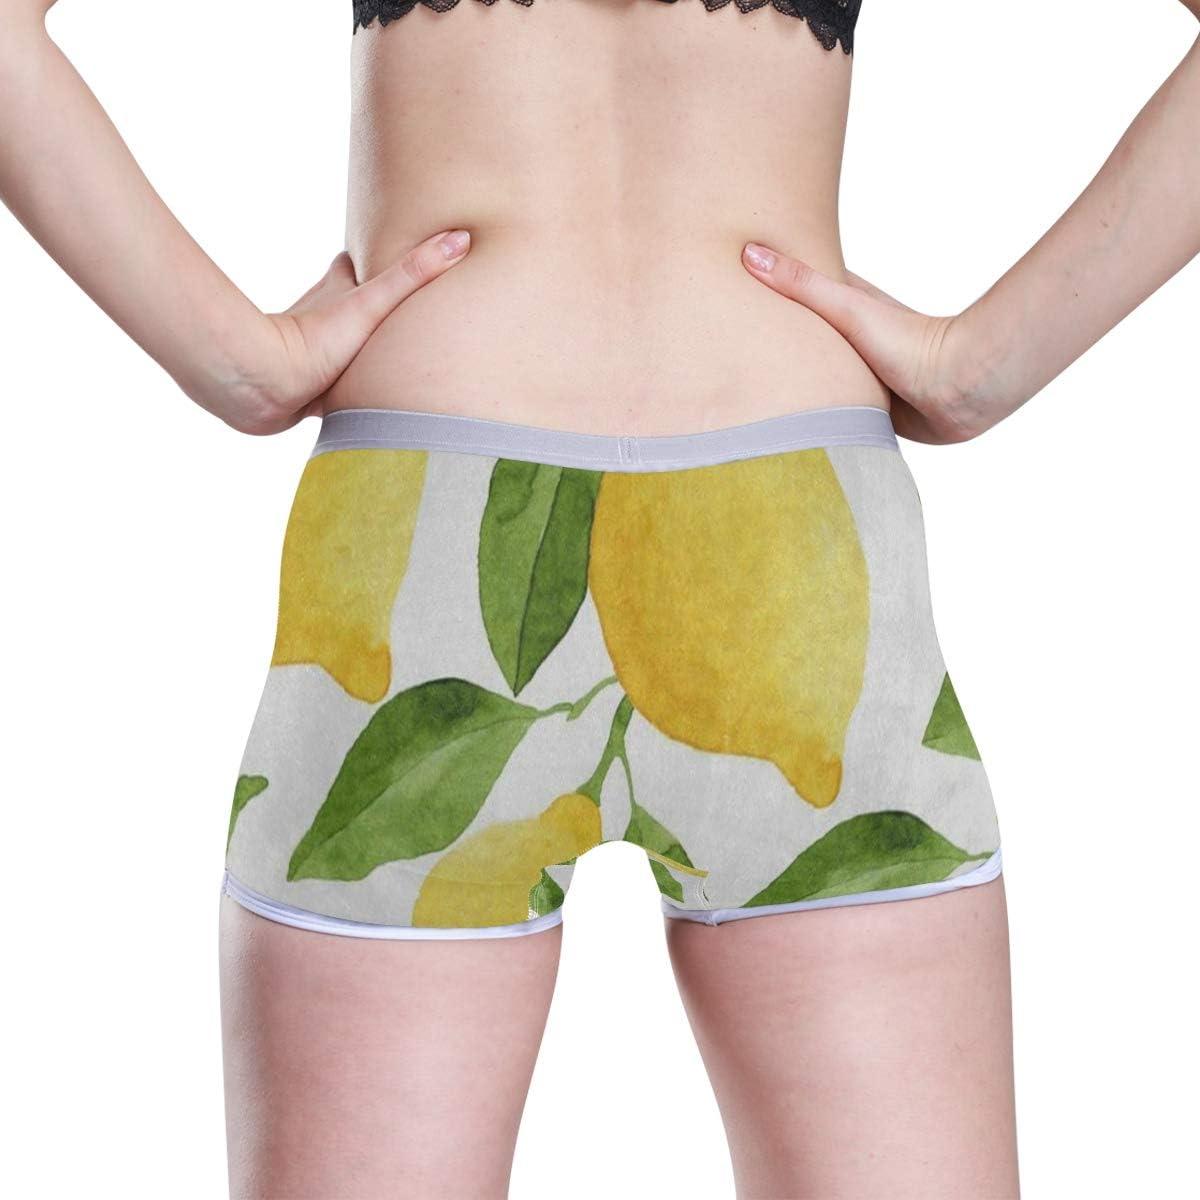 HangWang Autumn Colorful Forest Boyshort Panties Womens Breathable Boyshort Hipster Panty Underwear